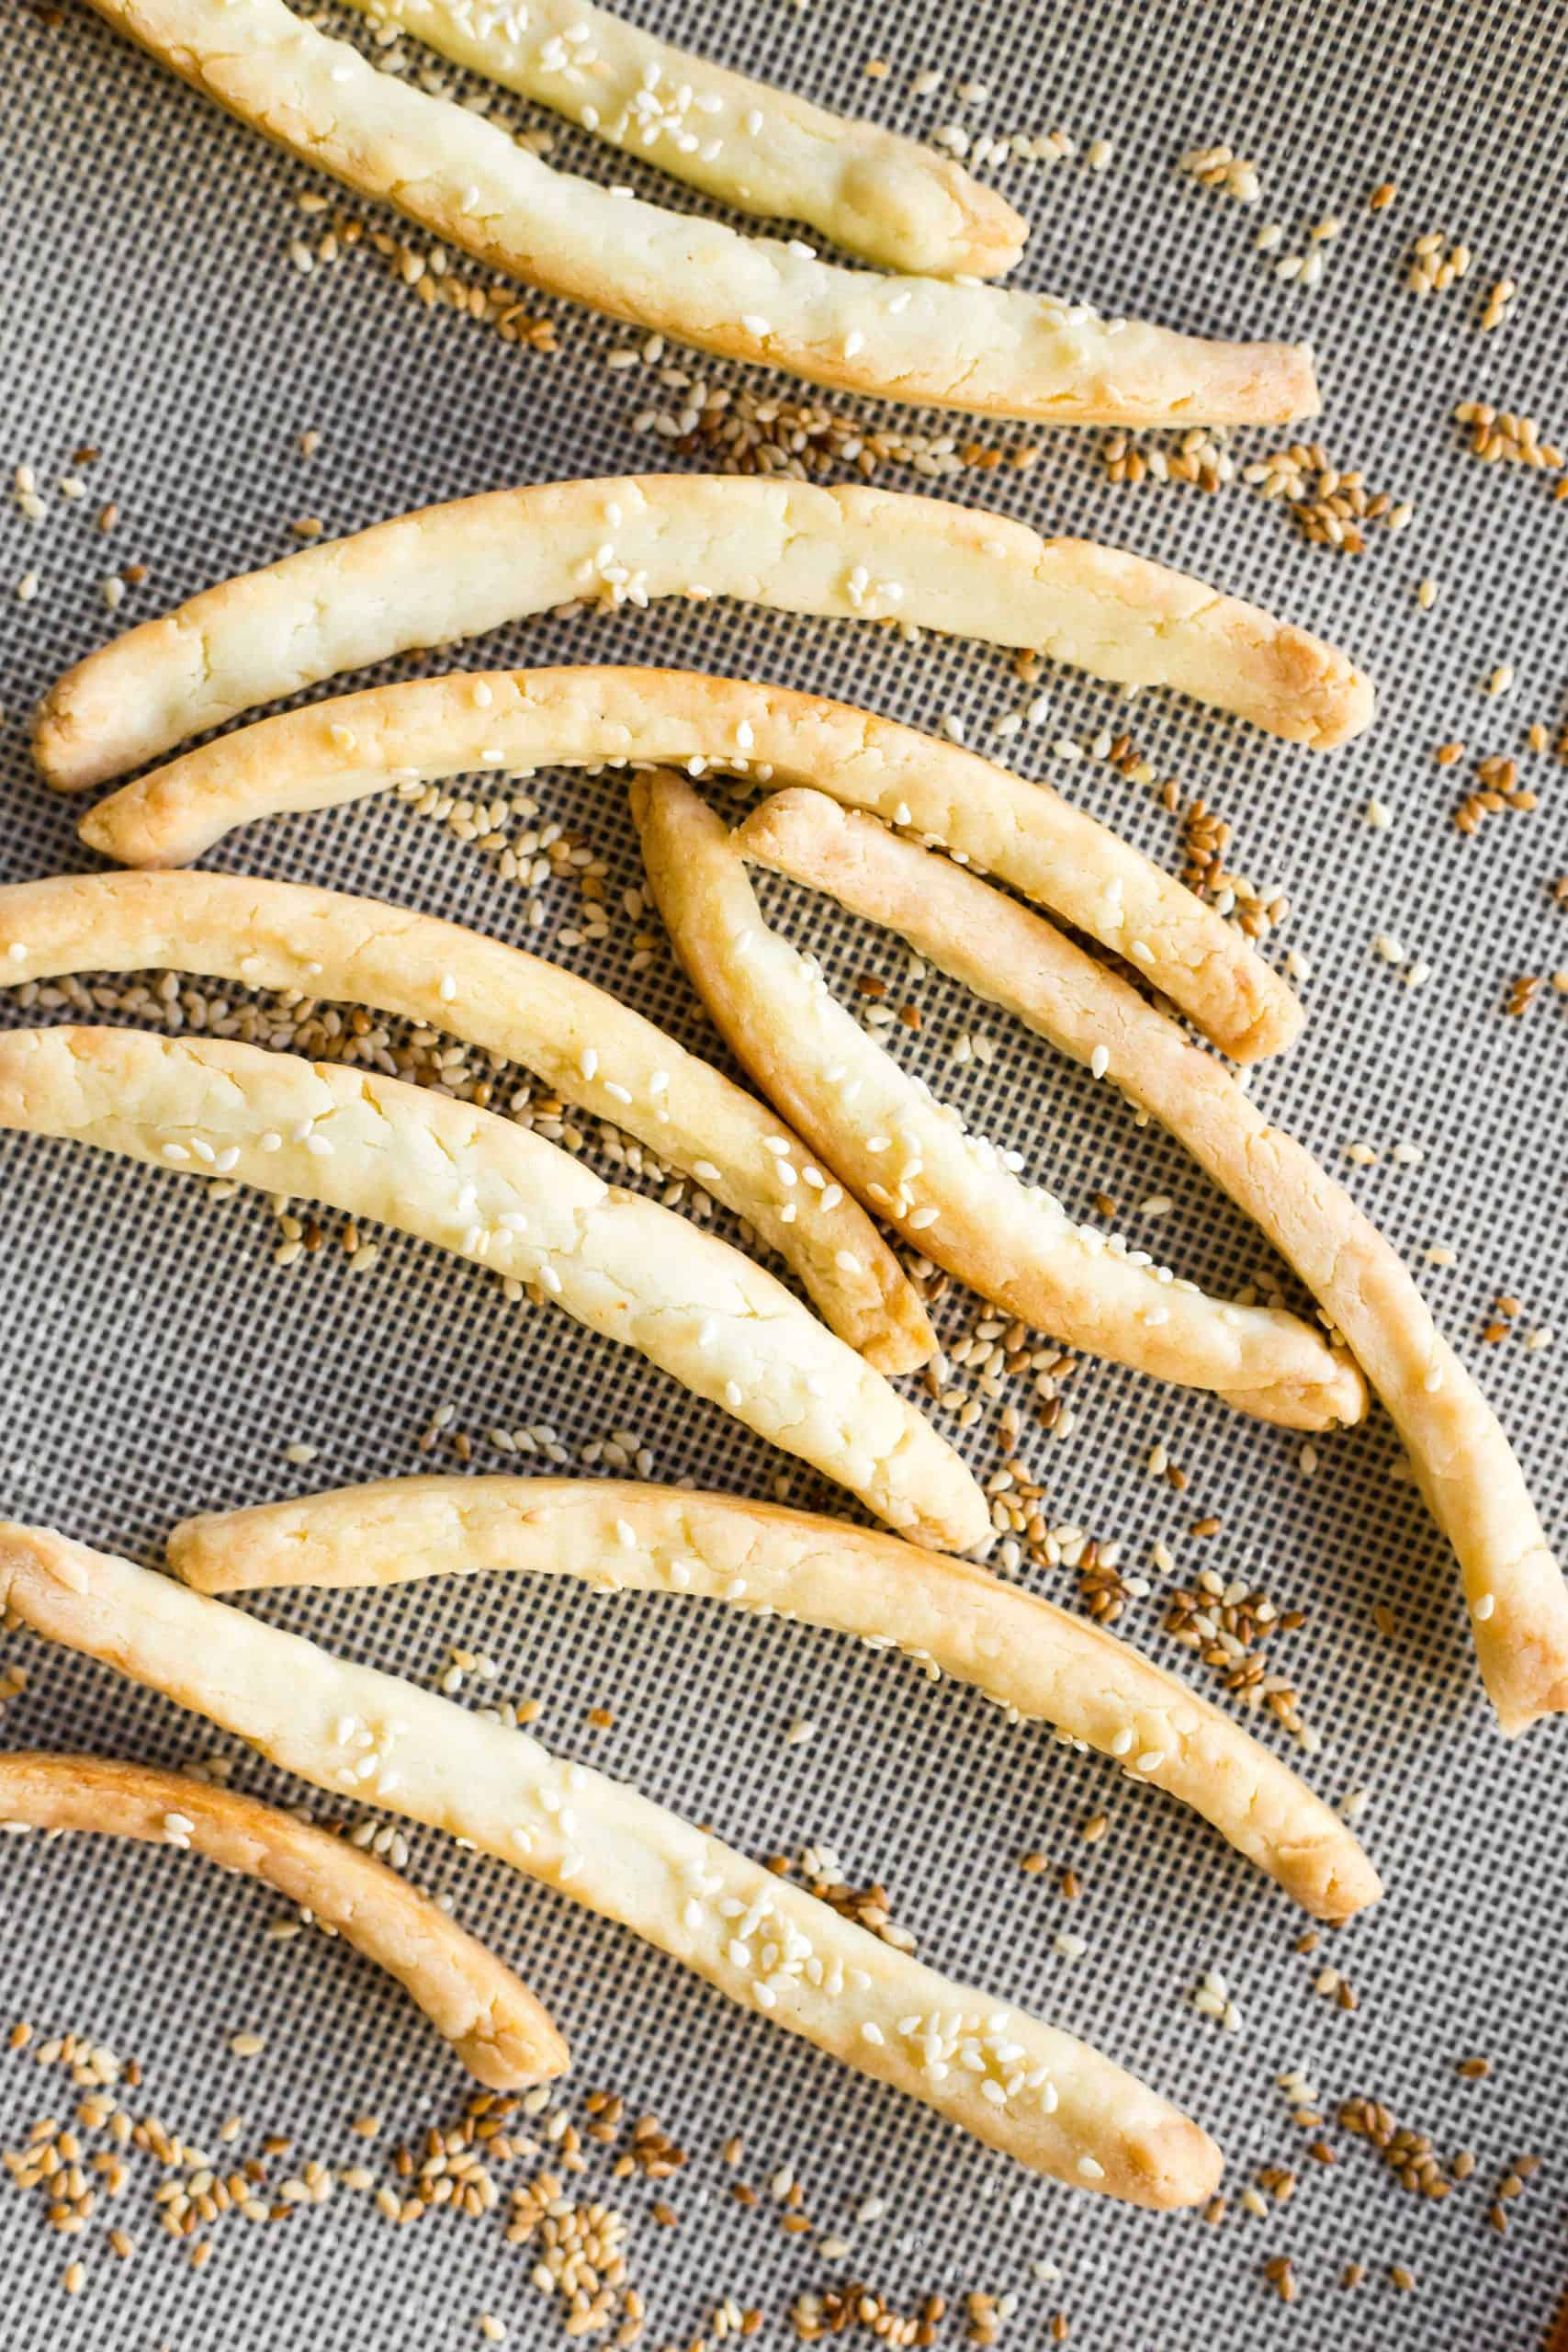 Baked breadsticks on a silpat.